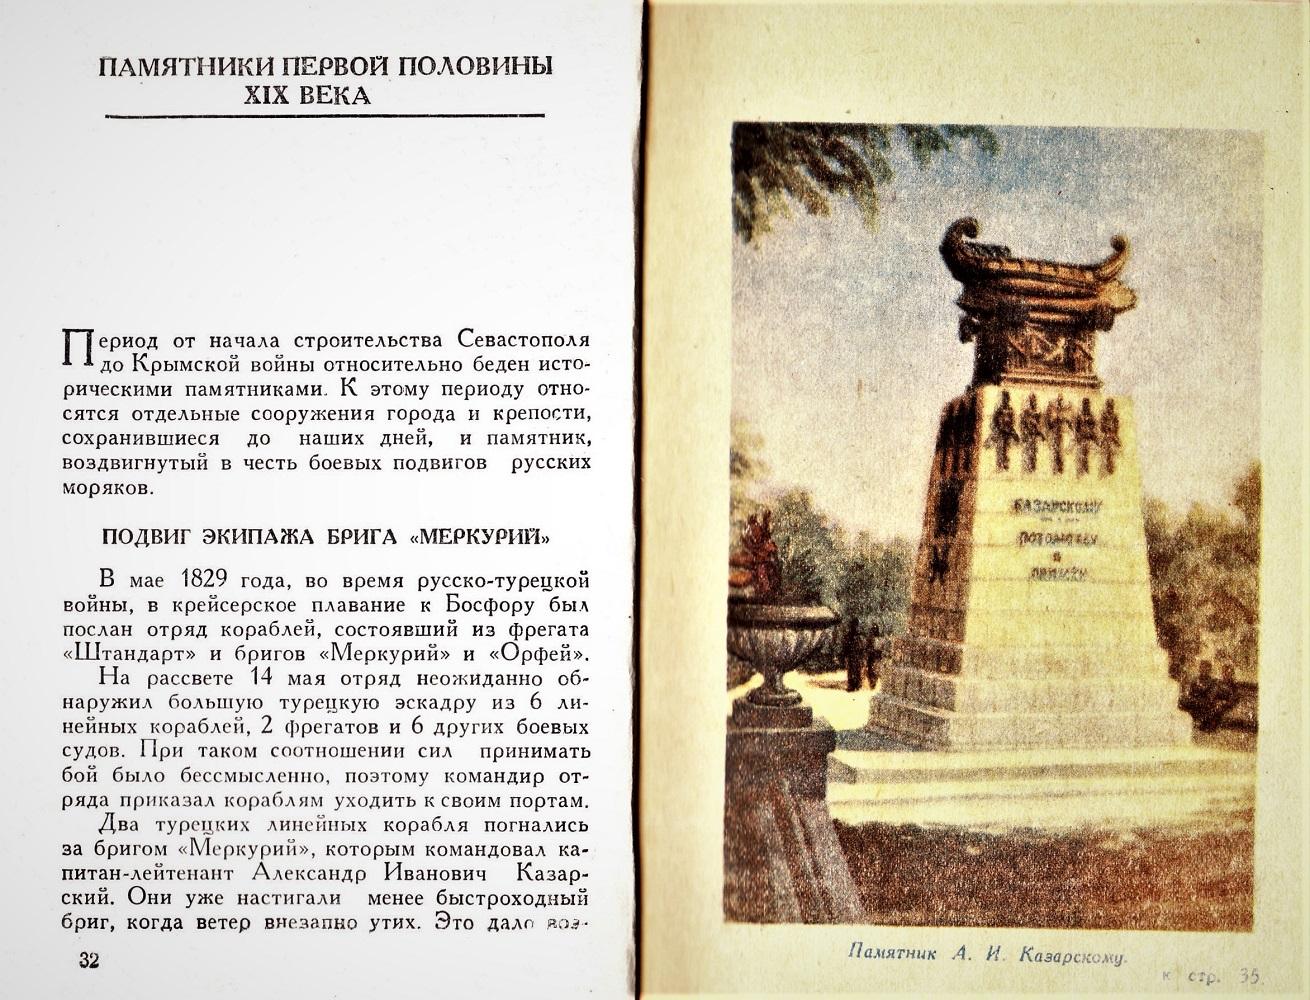 "О подвиге экипажа брига ""Меркурий"" и памятник командиру брига А.И. Казарскому."